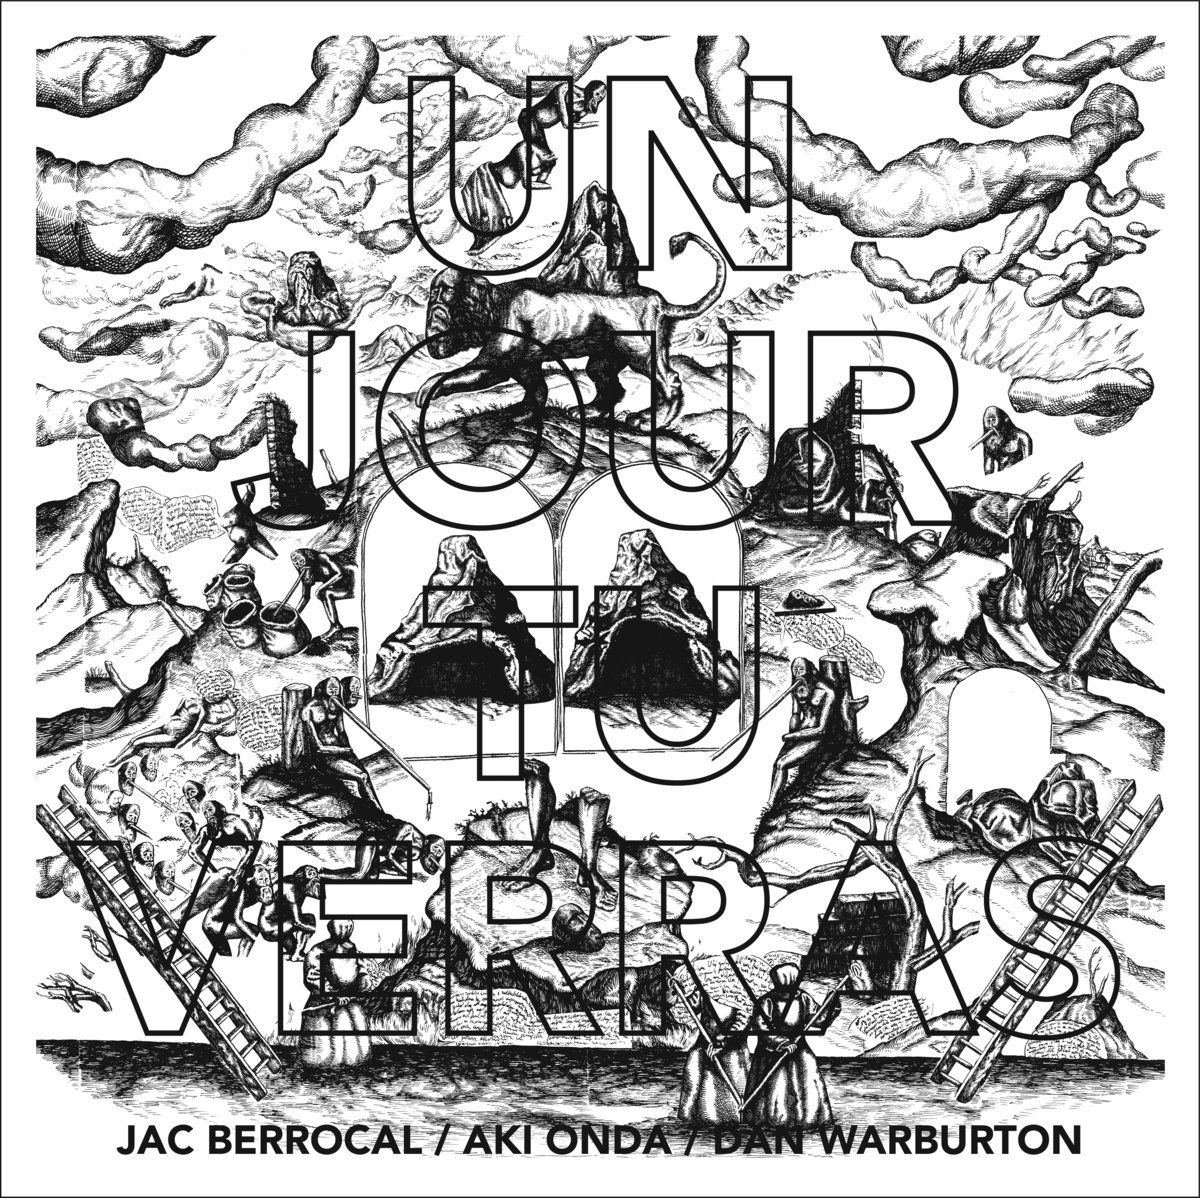 Jac Berrocal.